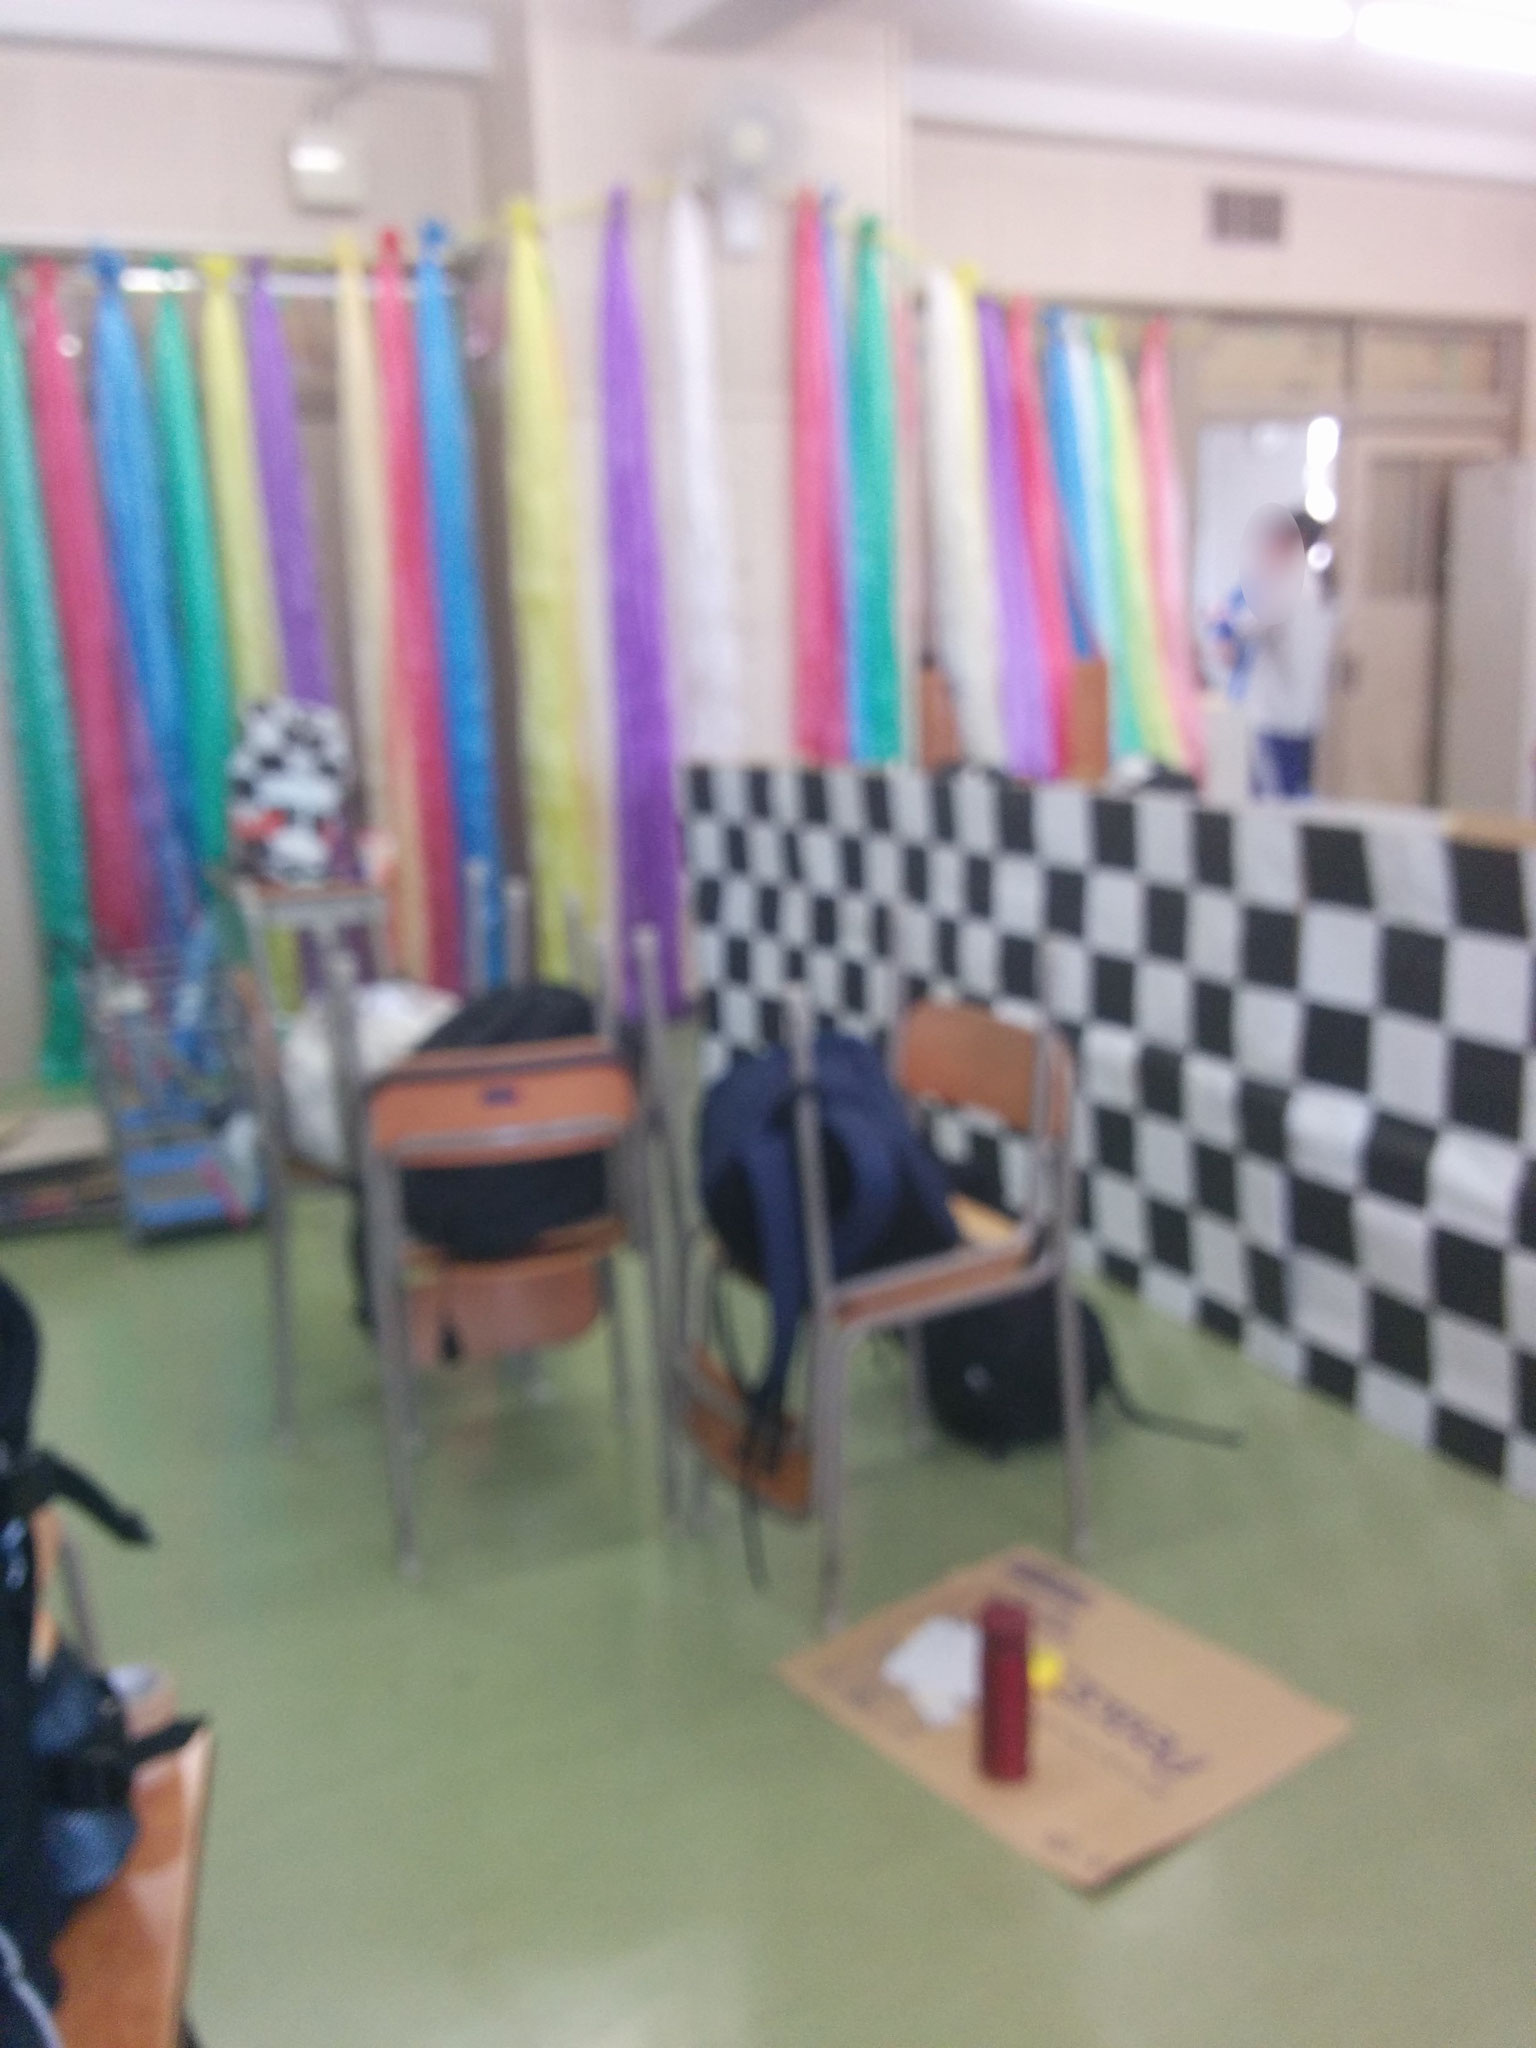 2 My classroom